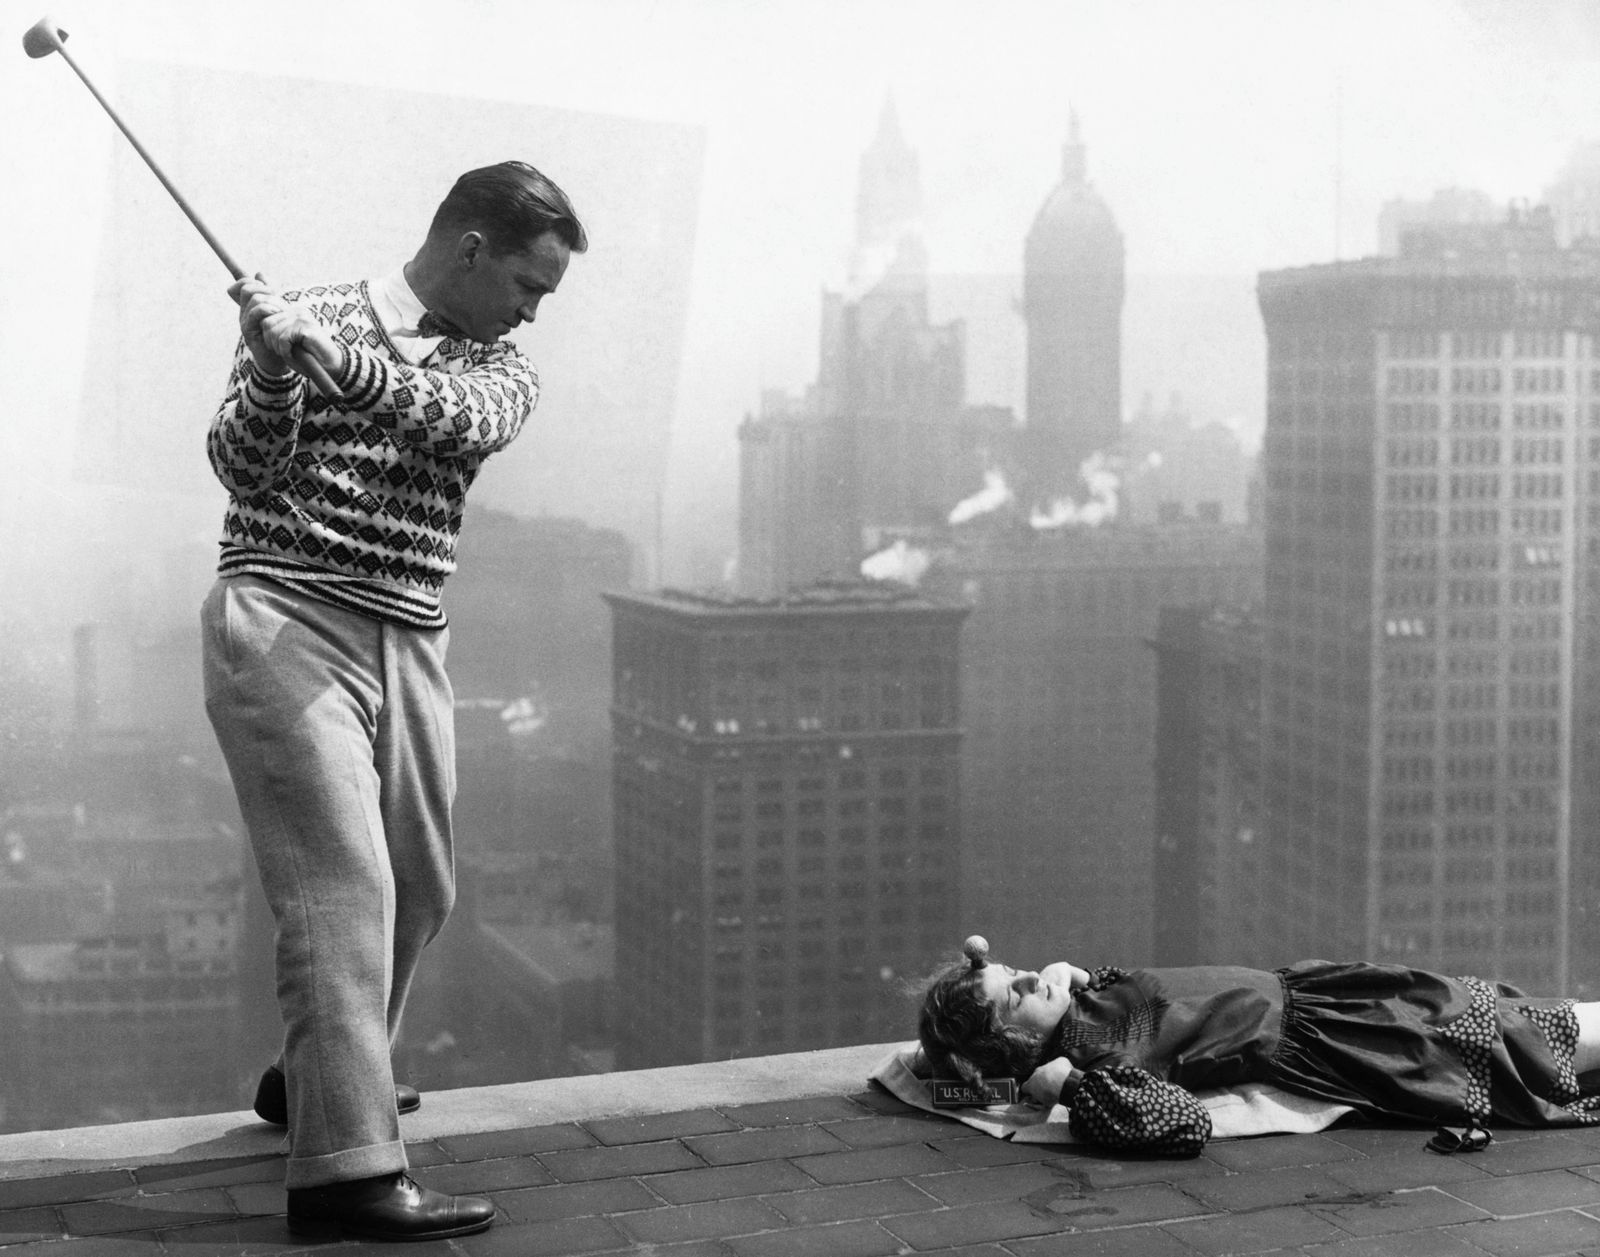 Jack Redmond - Man Swinging at Golf Ball on Woman's Forehead